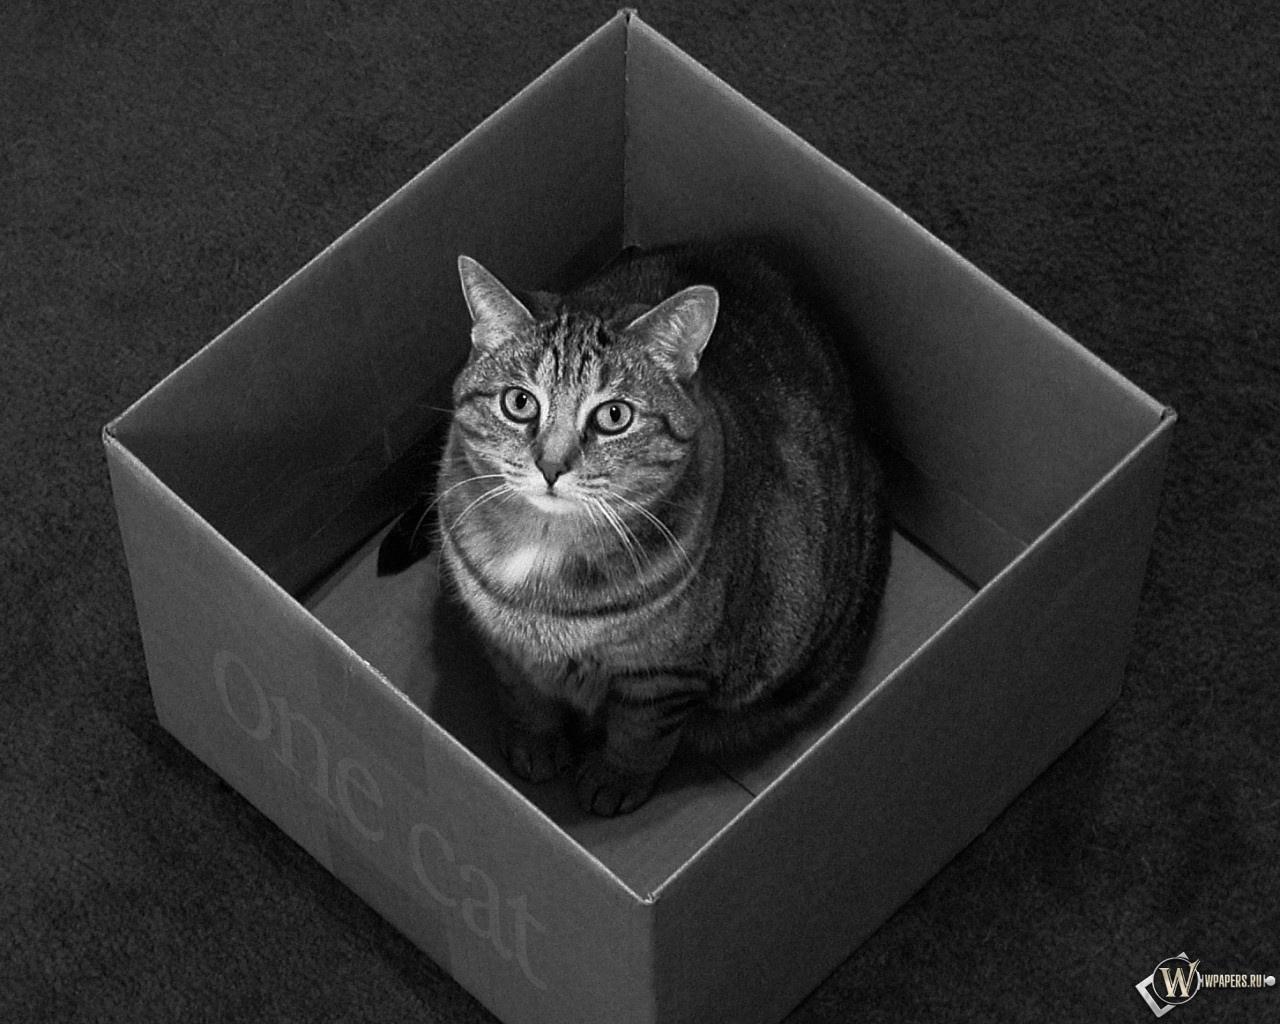 Кот в коробке 1280x1024